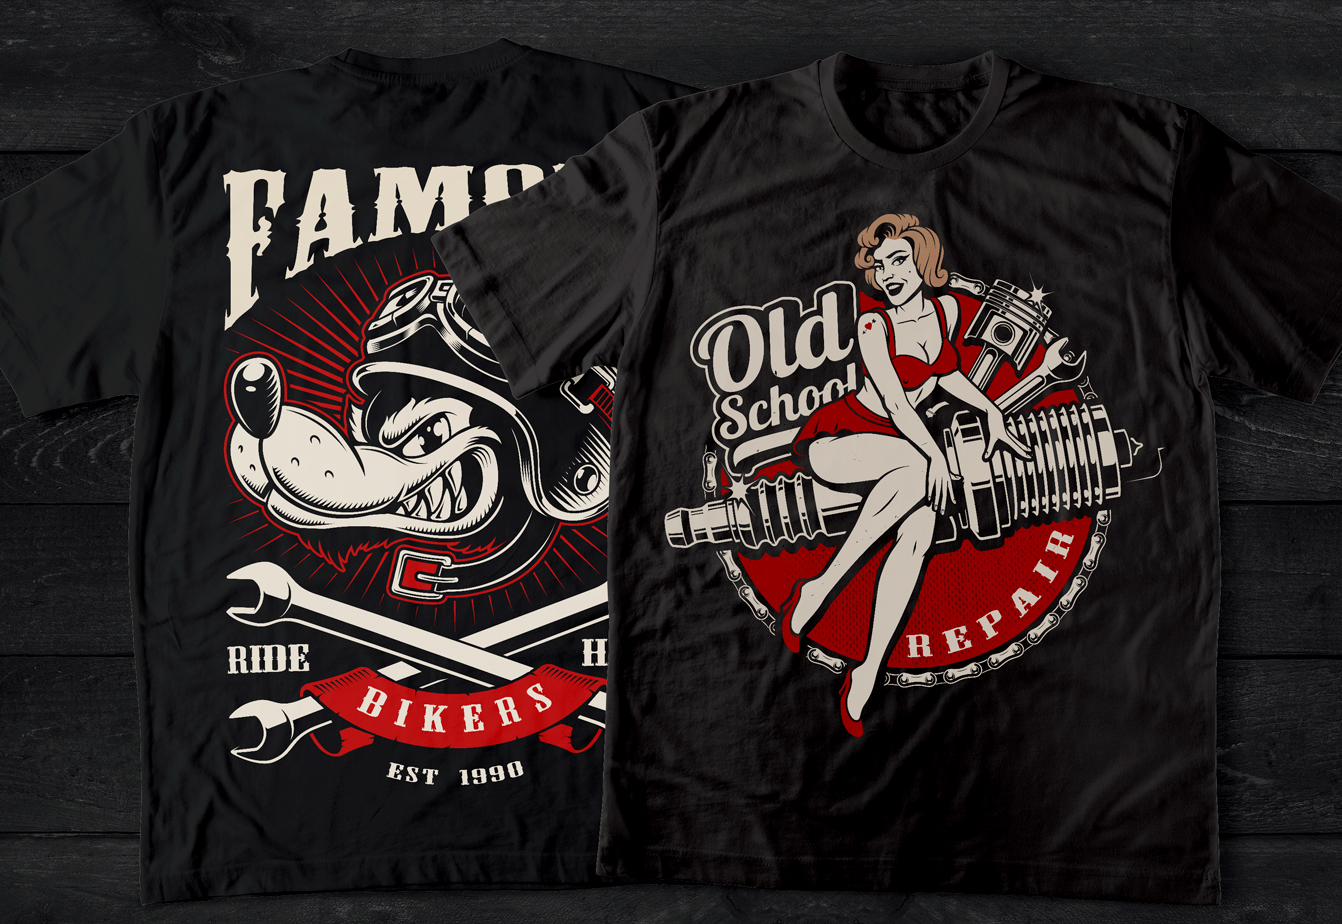 94bfccdf3 Offensive Biker T Shirts - DREAMWORKS